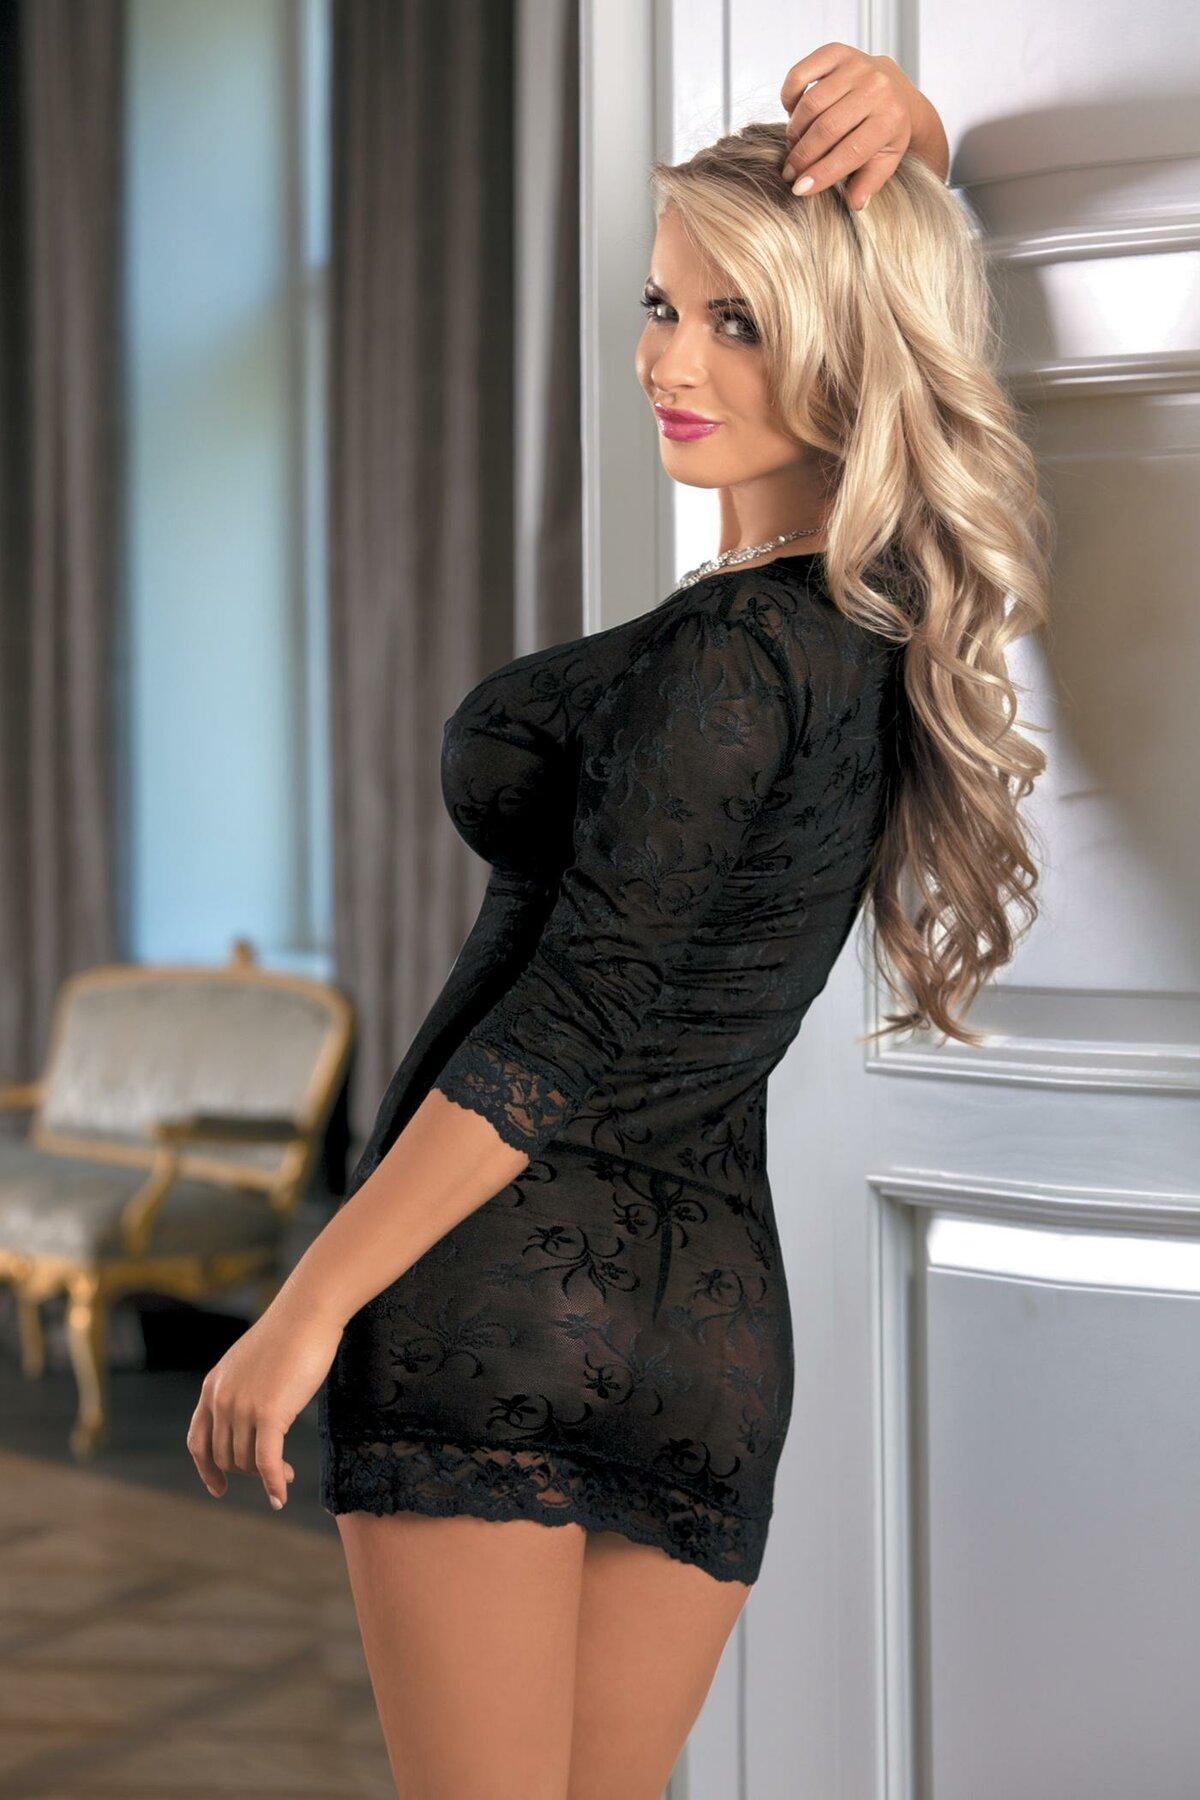 Hot european girl